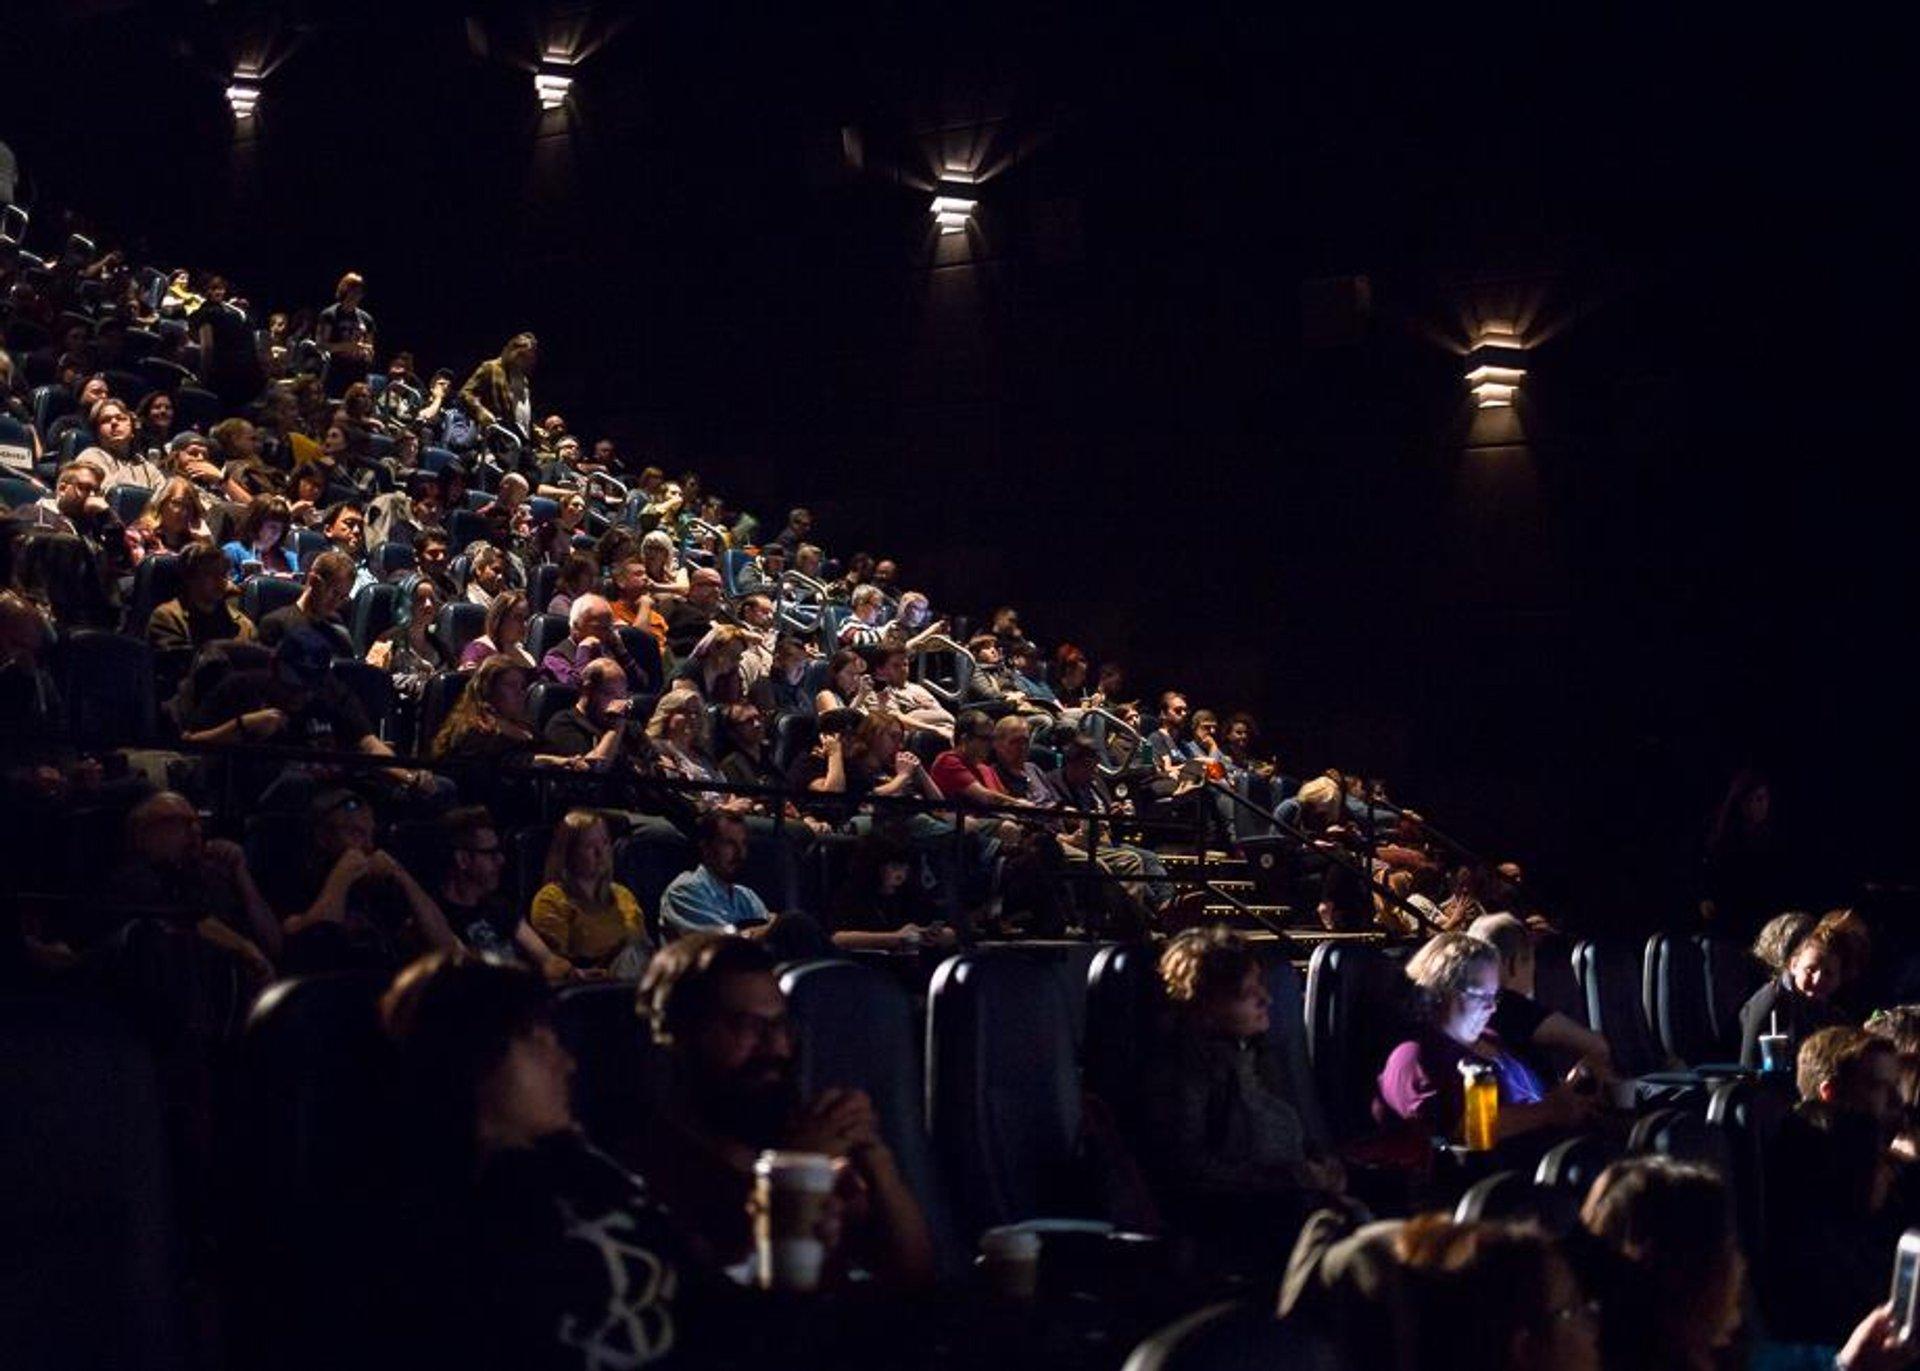 Toronto After Dark Film Festival in Toronto - Best Season 2020